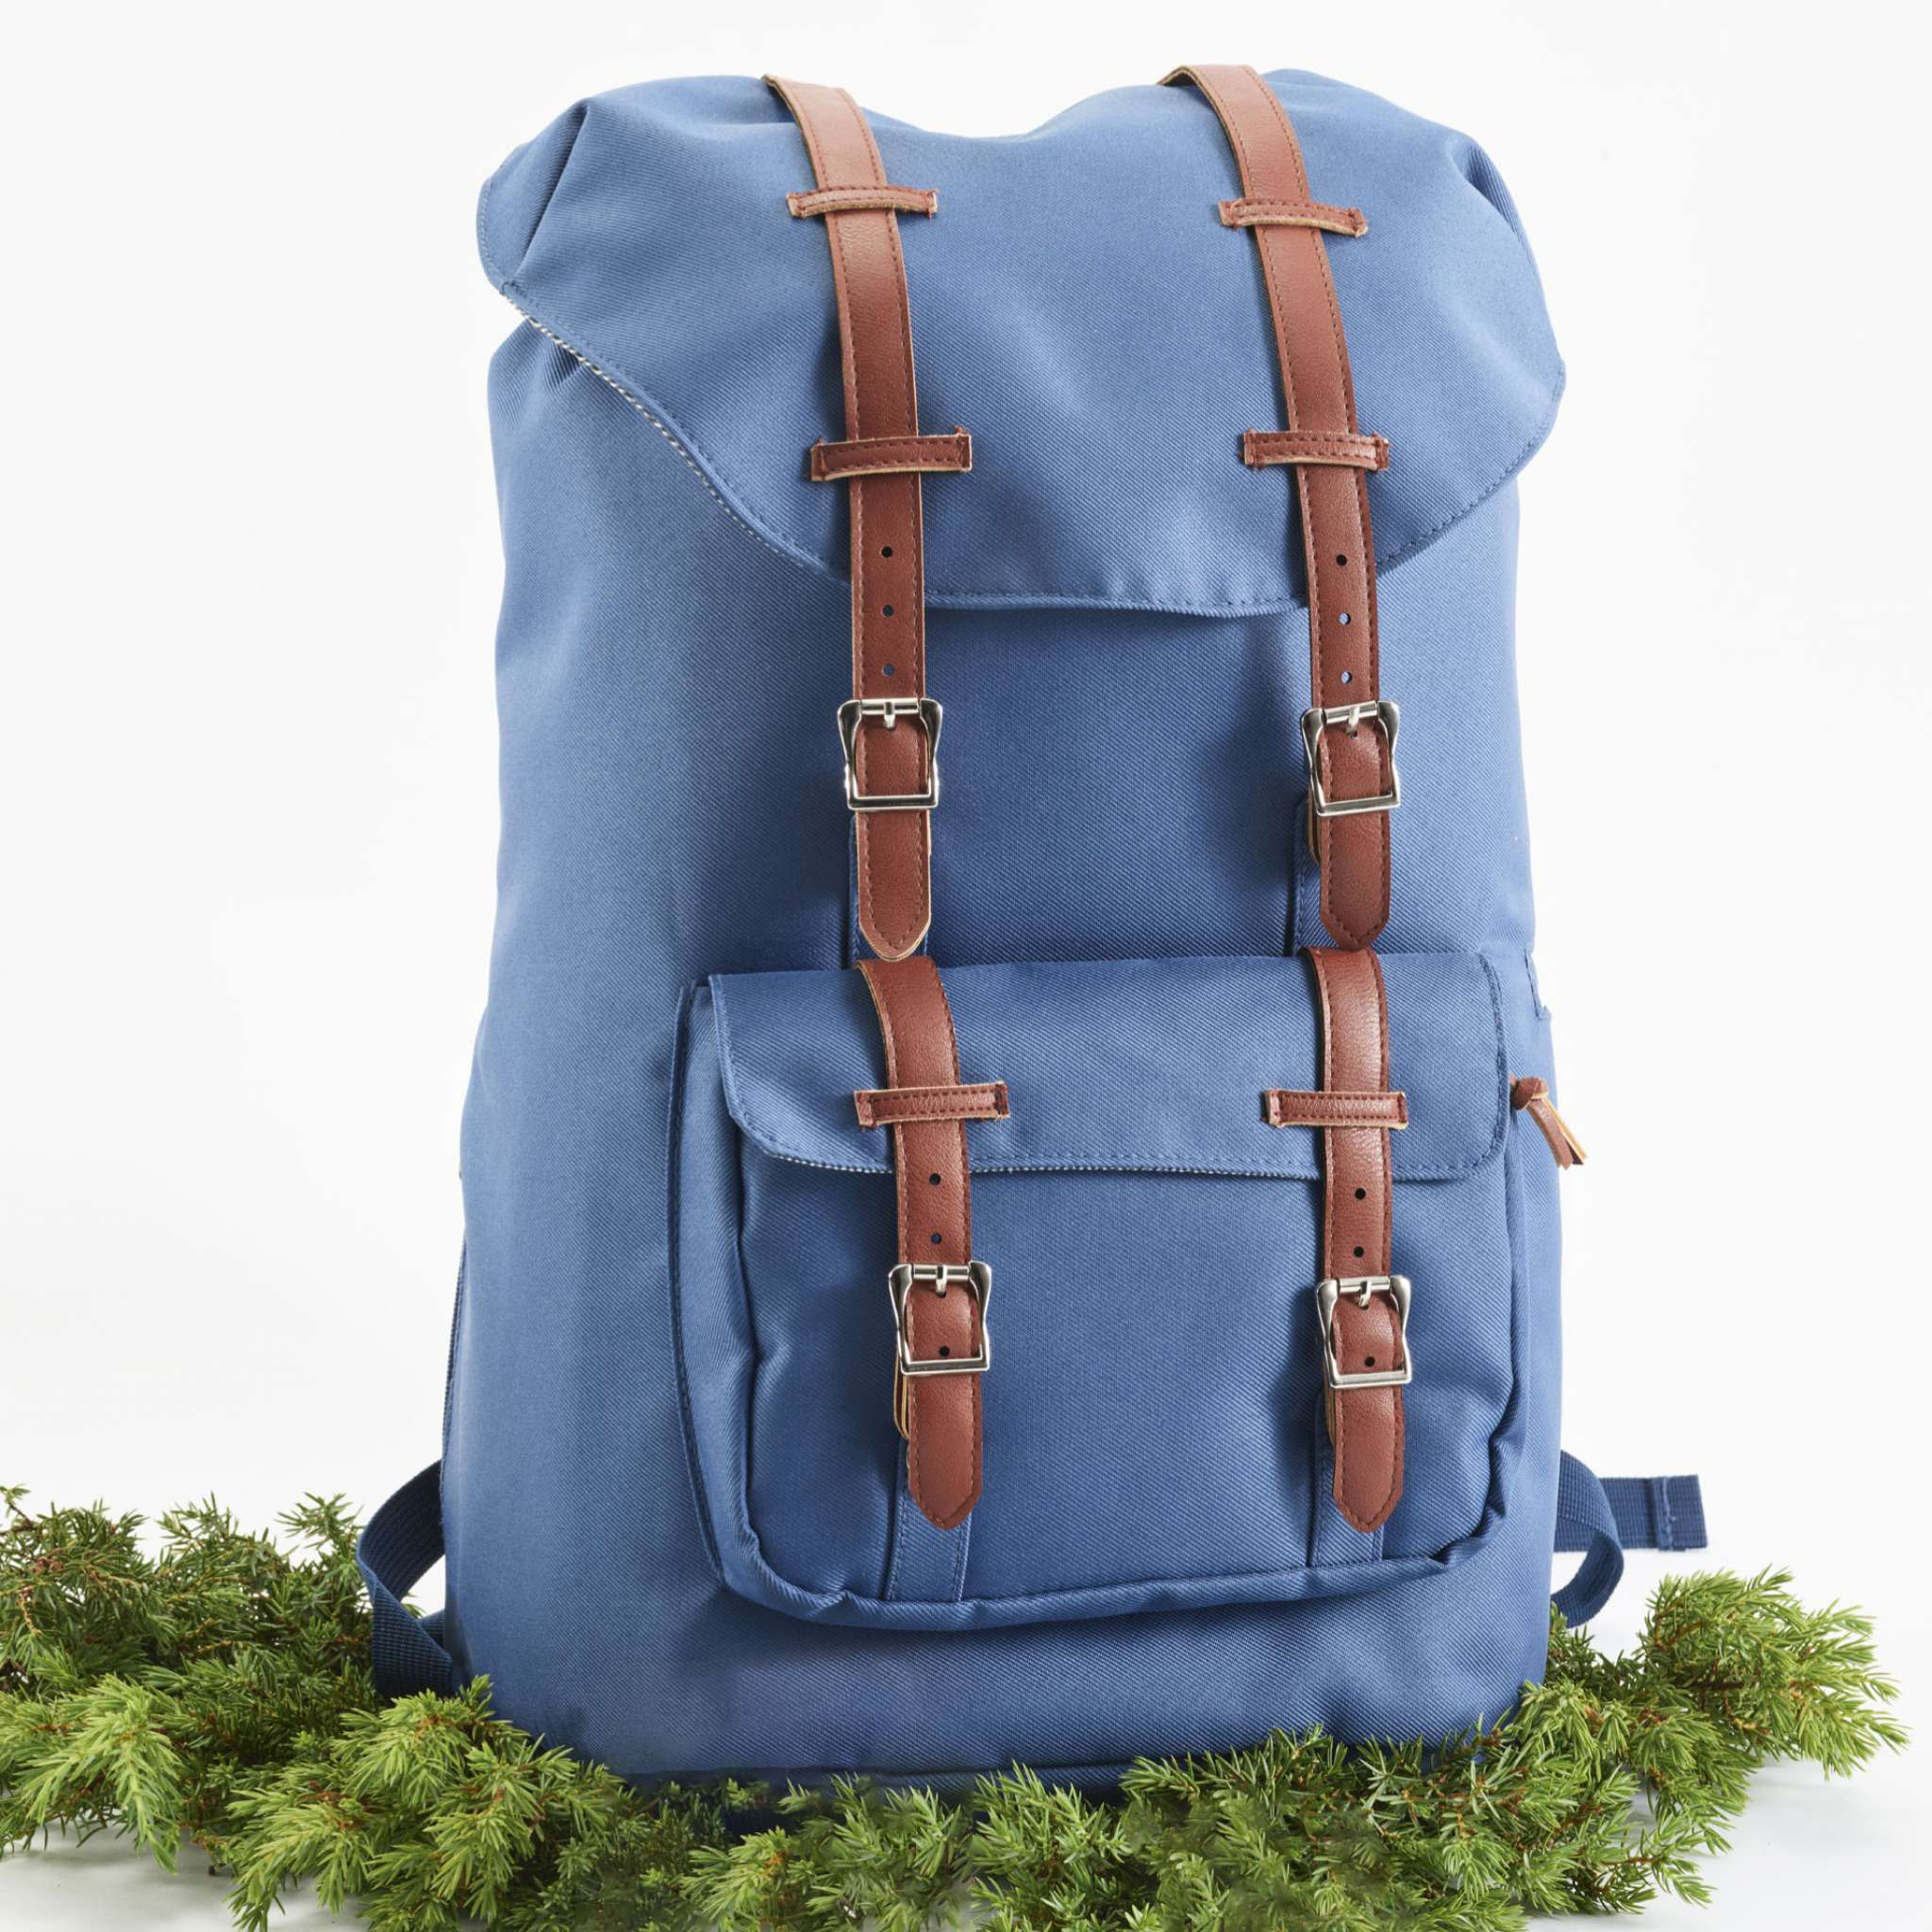 Retro ryggsäck